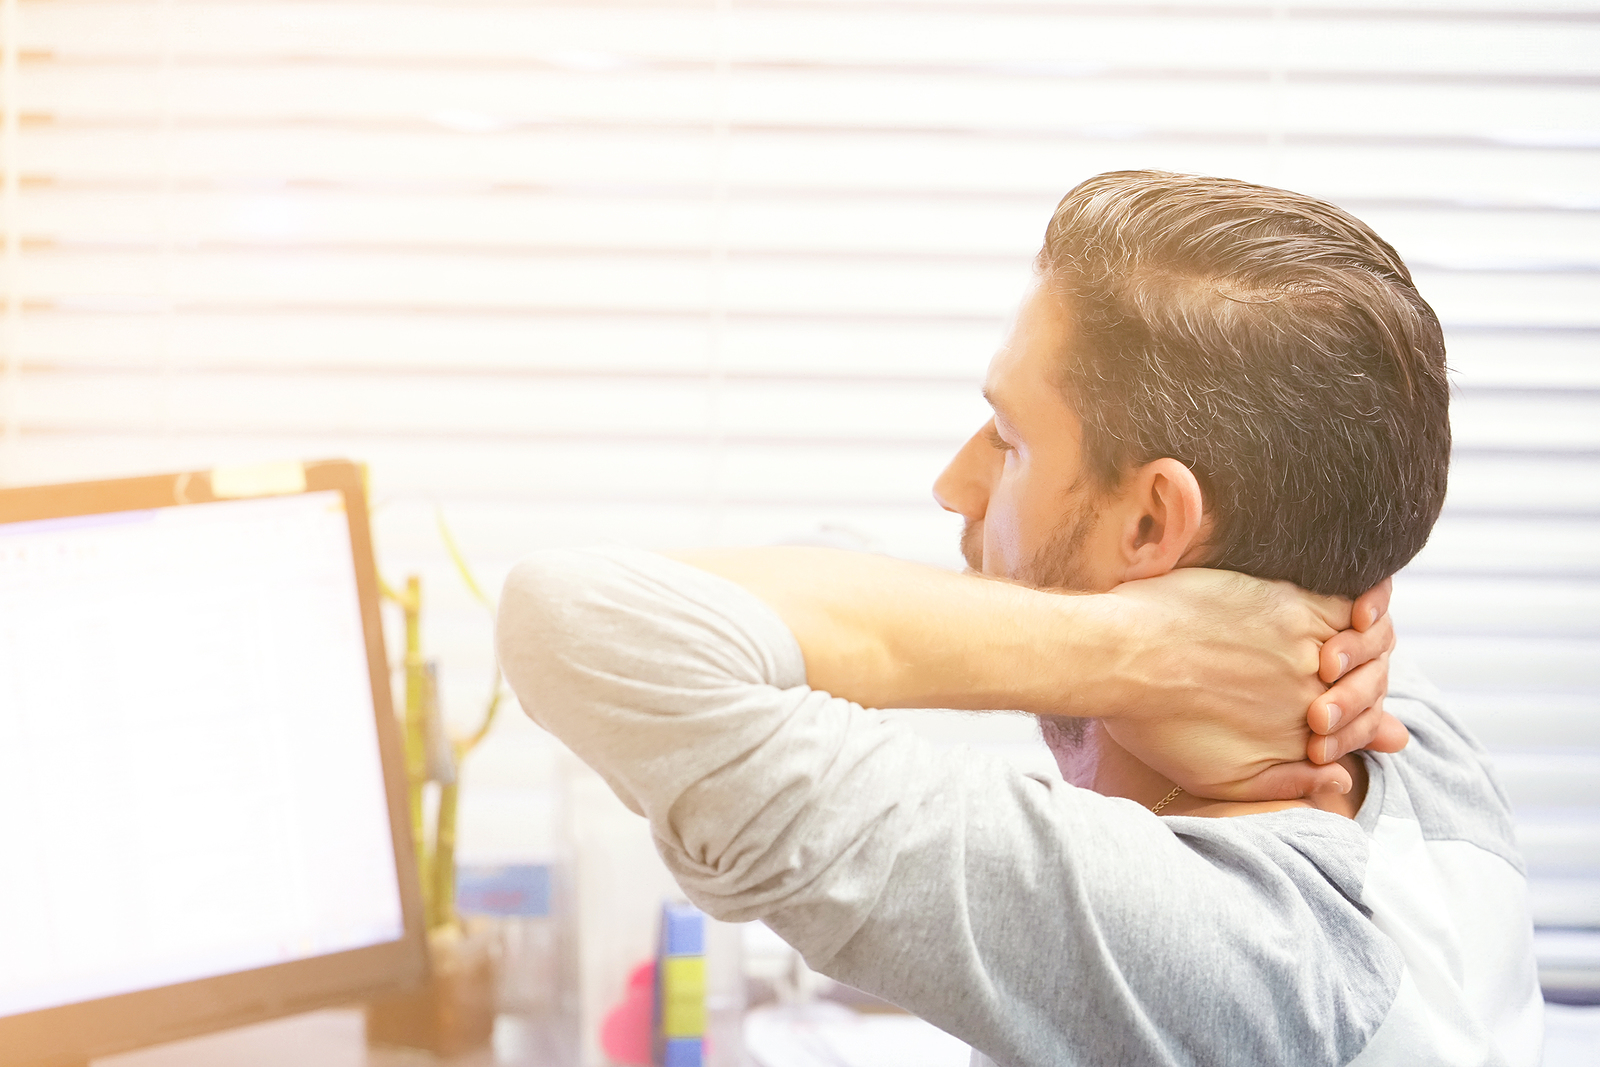 Office Worker Male Suffering From Neck Pain. Male Feeling Tired,